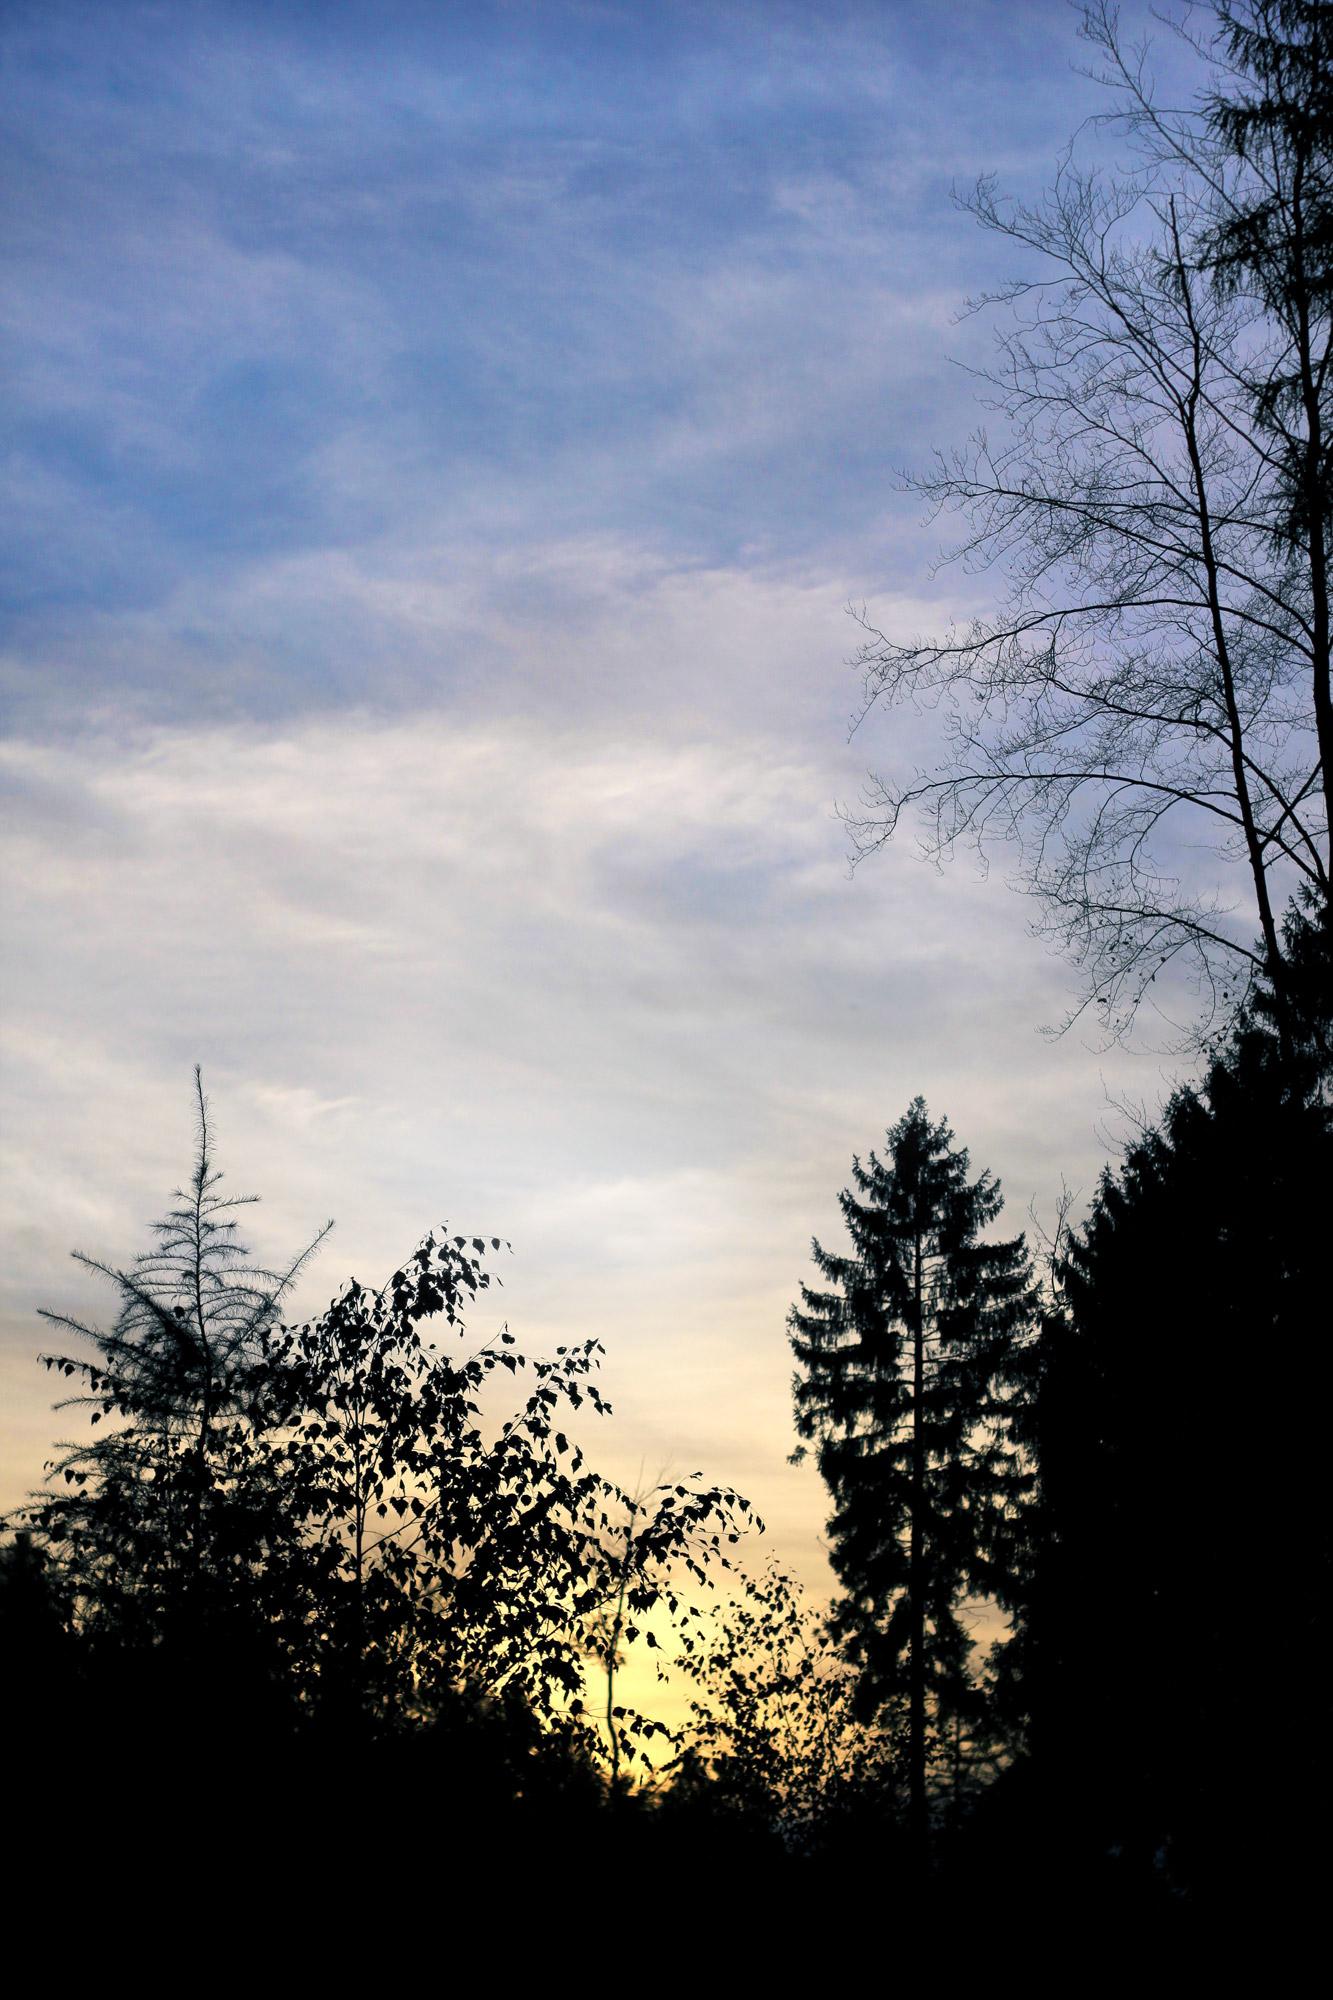 Bäume Silhouetten Abend